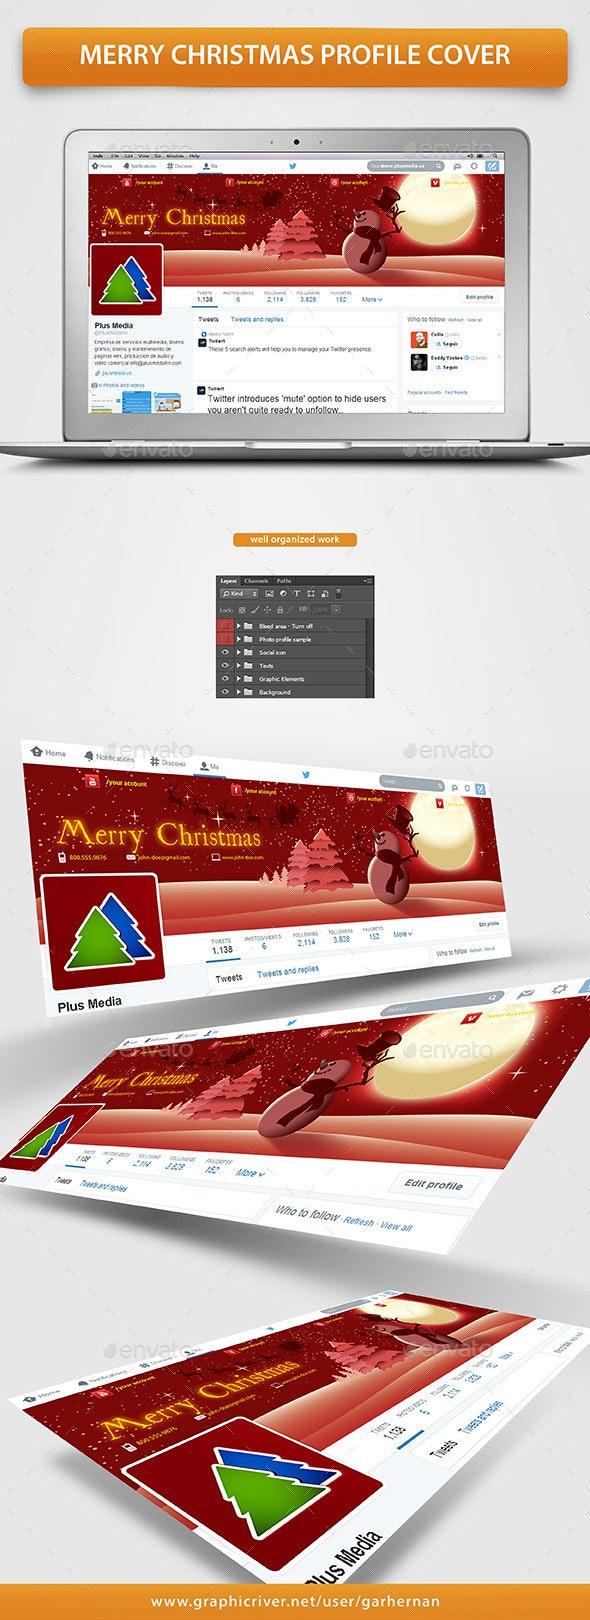 Merry Christmas Profile Cover - Twitter Social Media